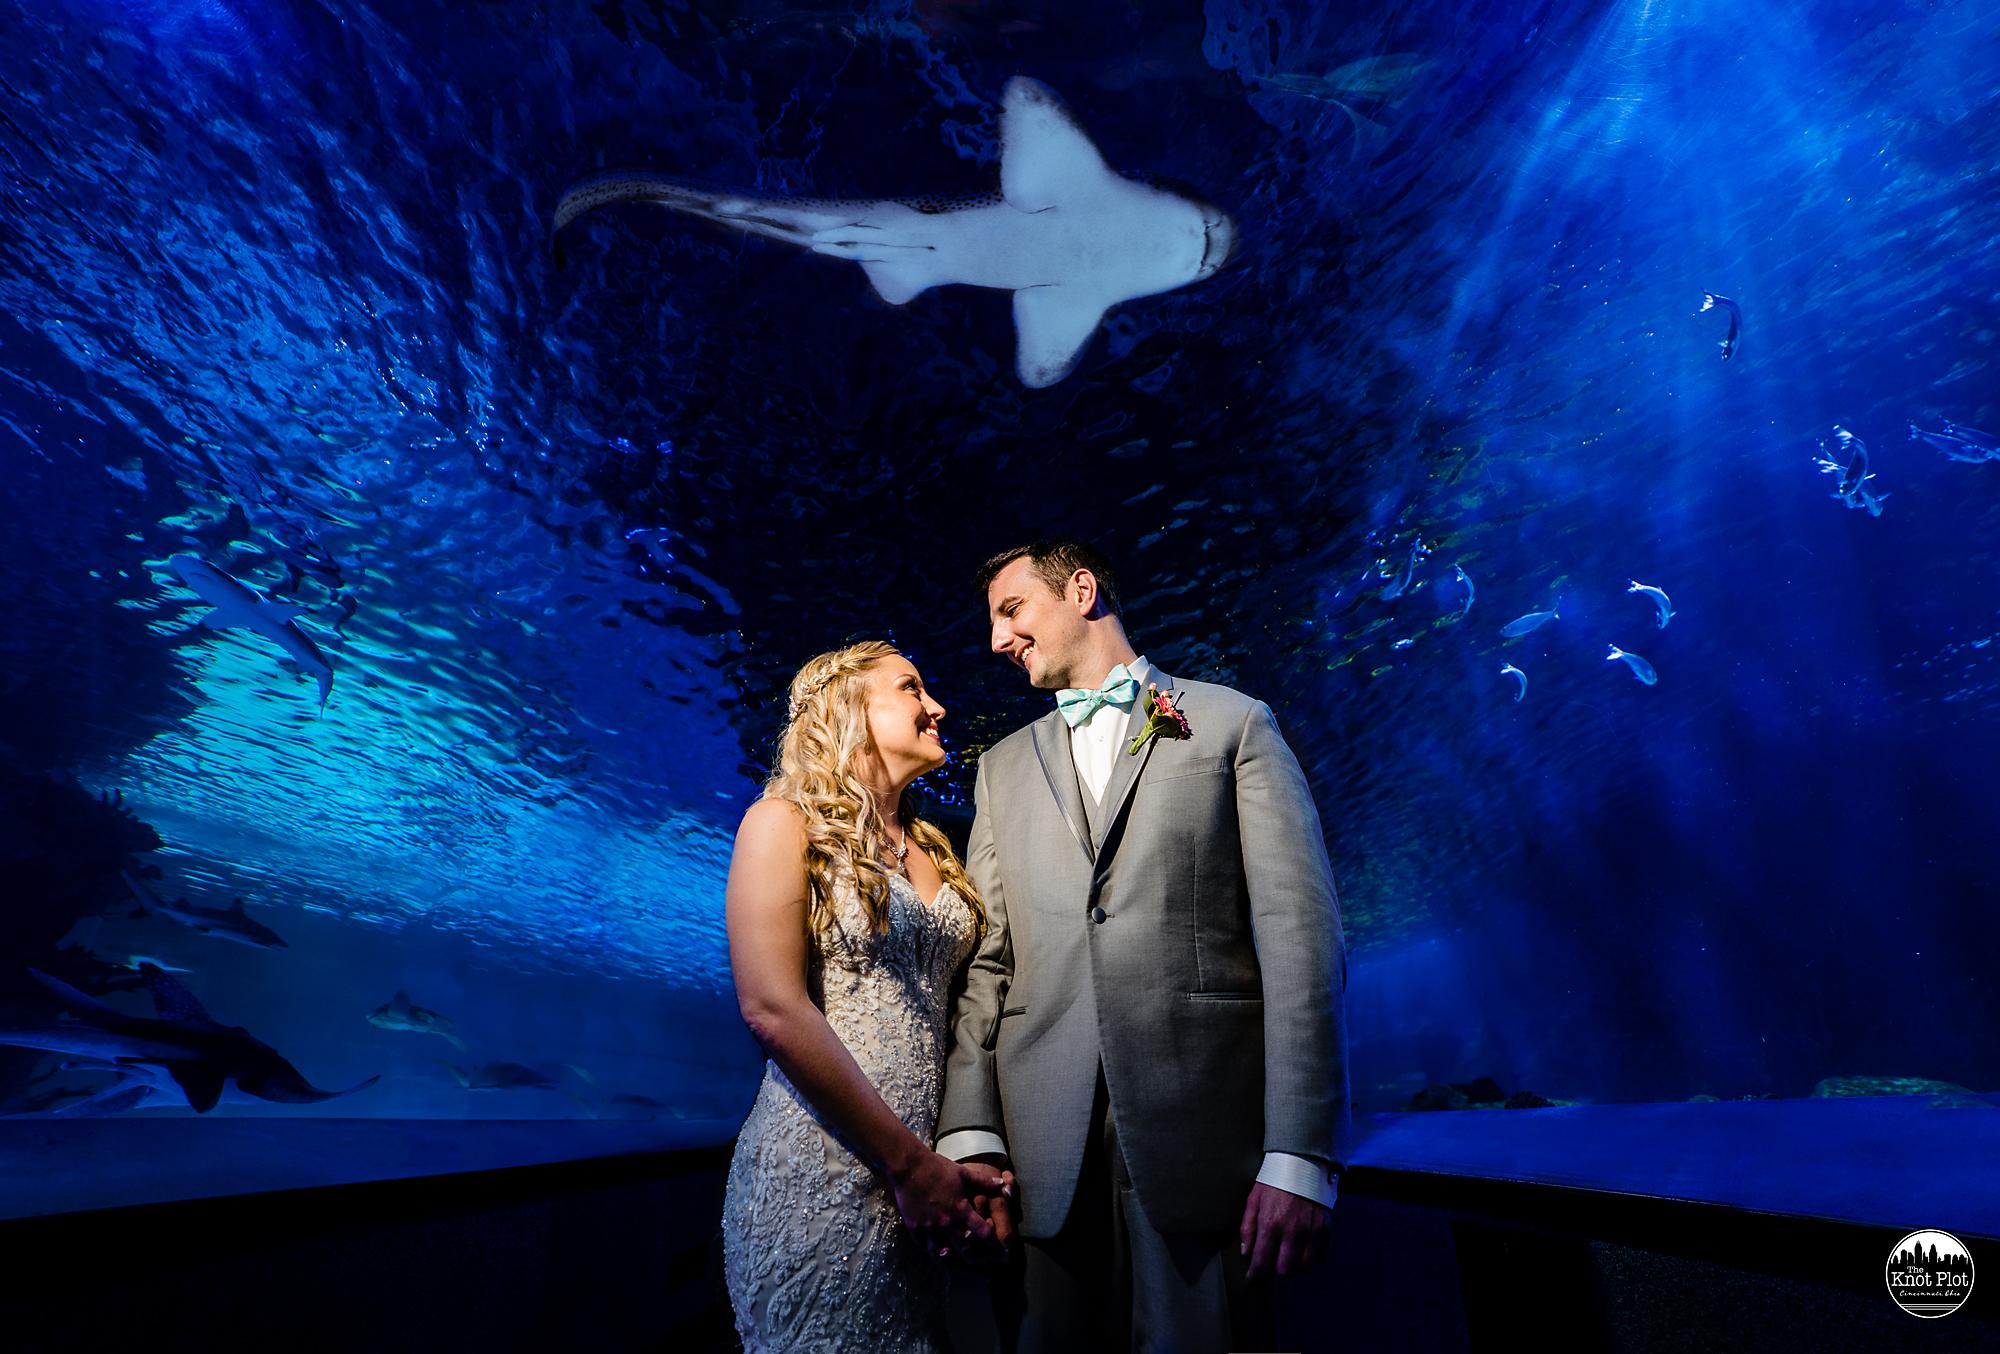 Newport-Aquarium-Wedding-Photos-3.jpg